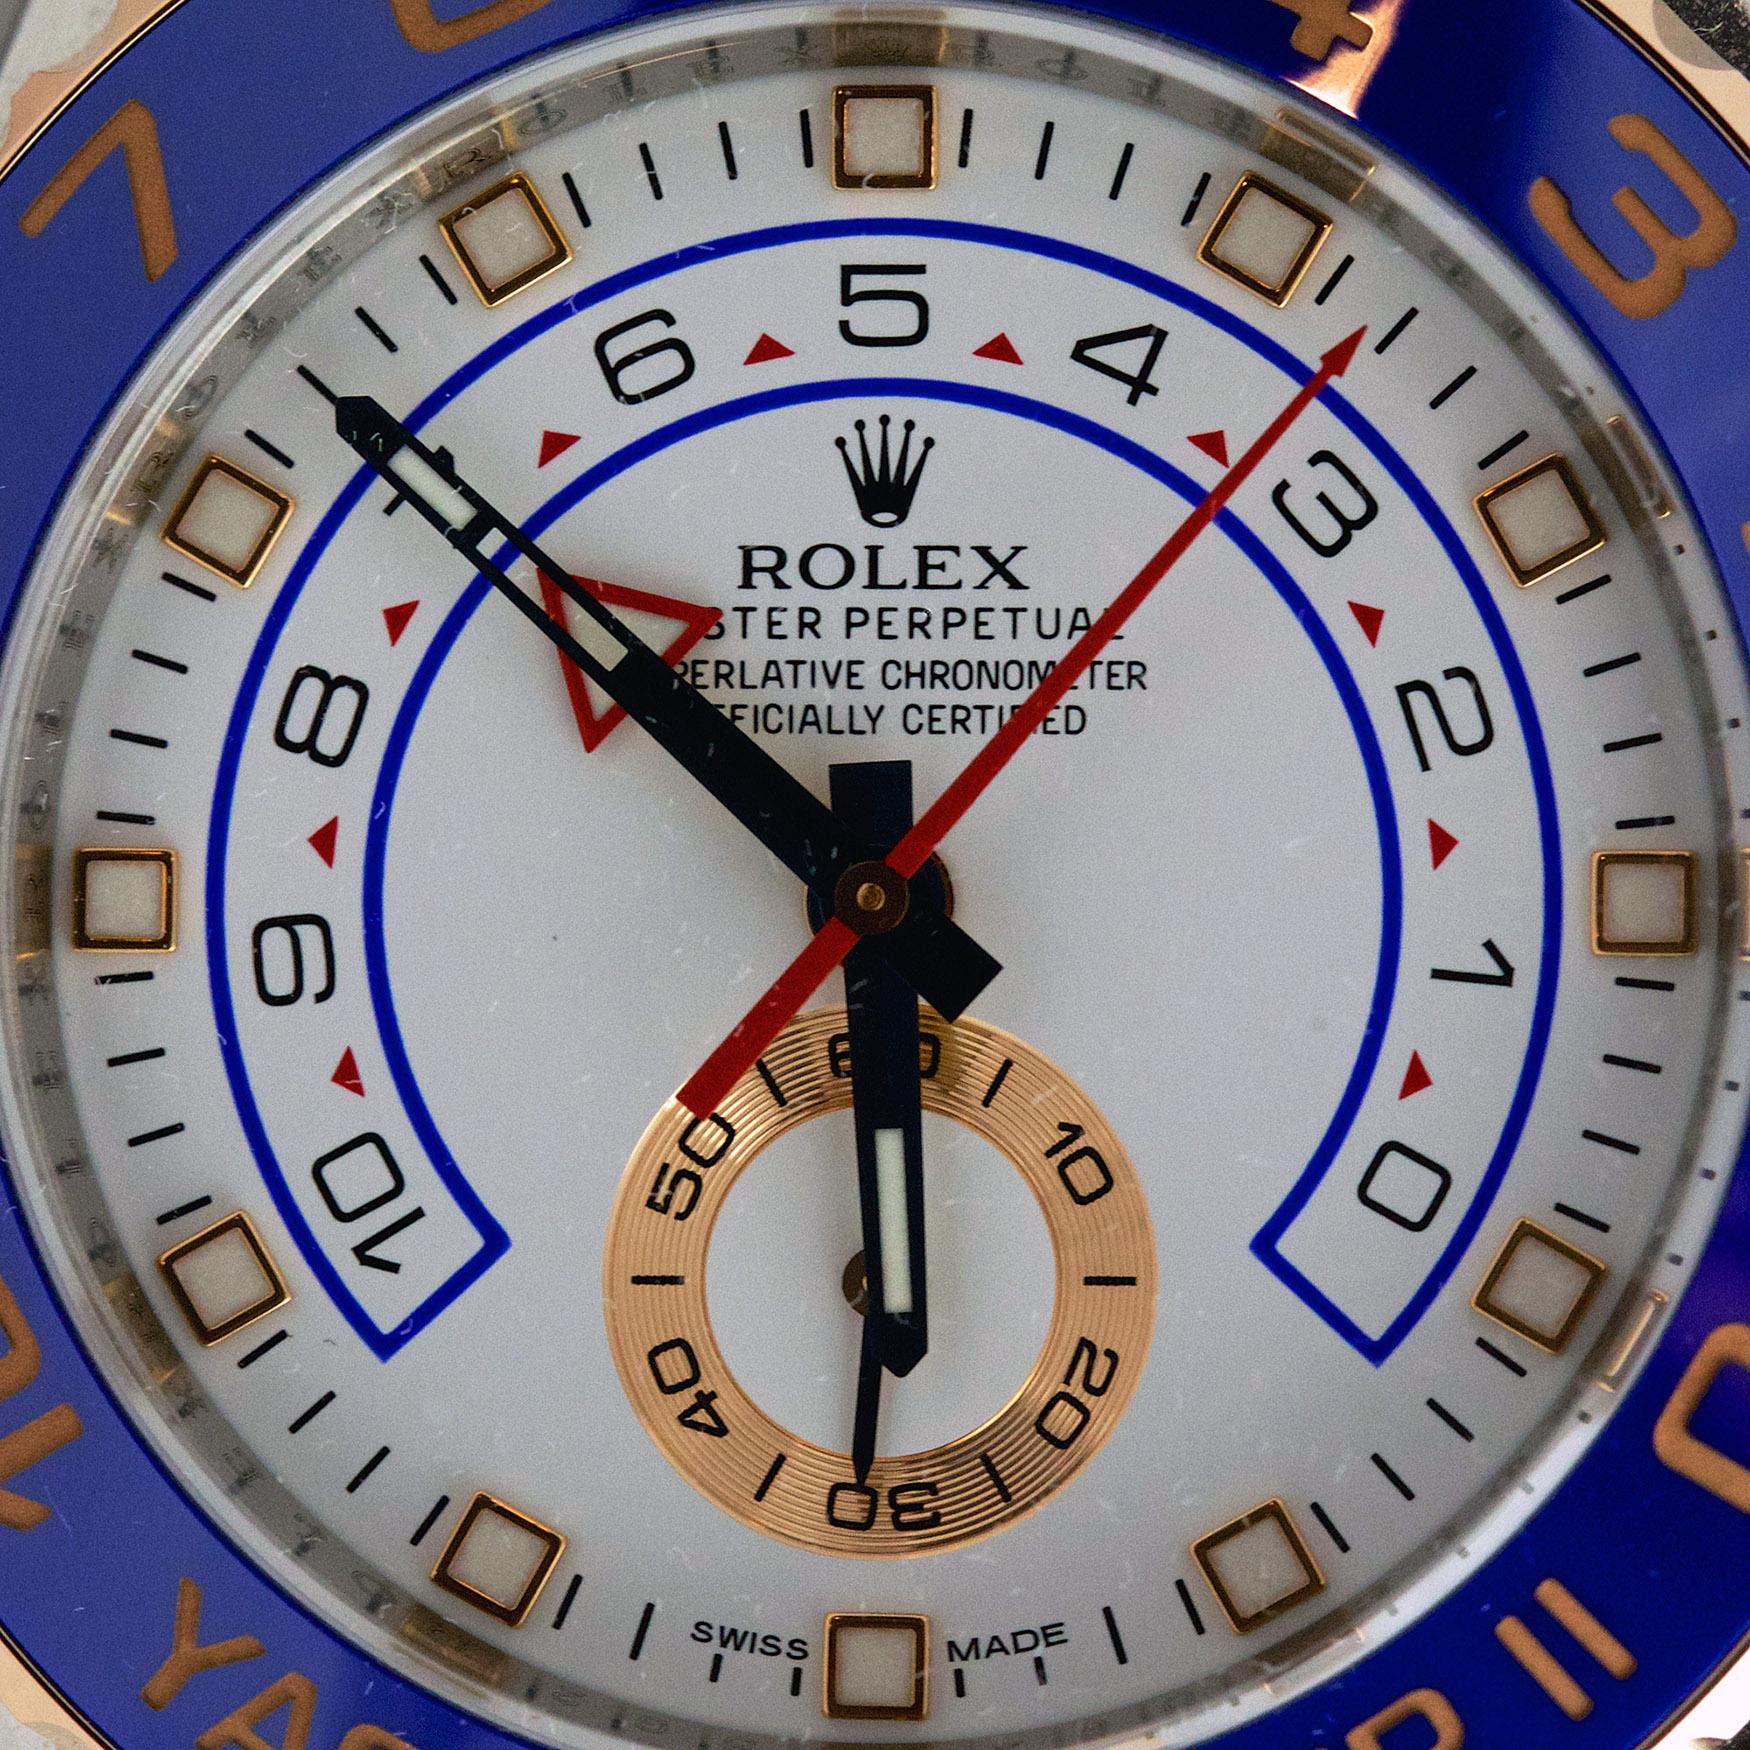 Rolex Yacht-Master II Ref. 116681 replica